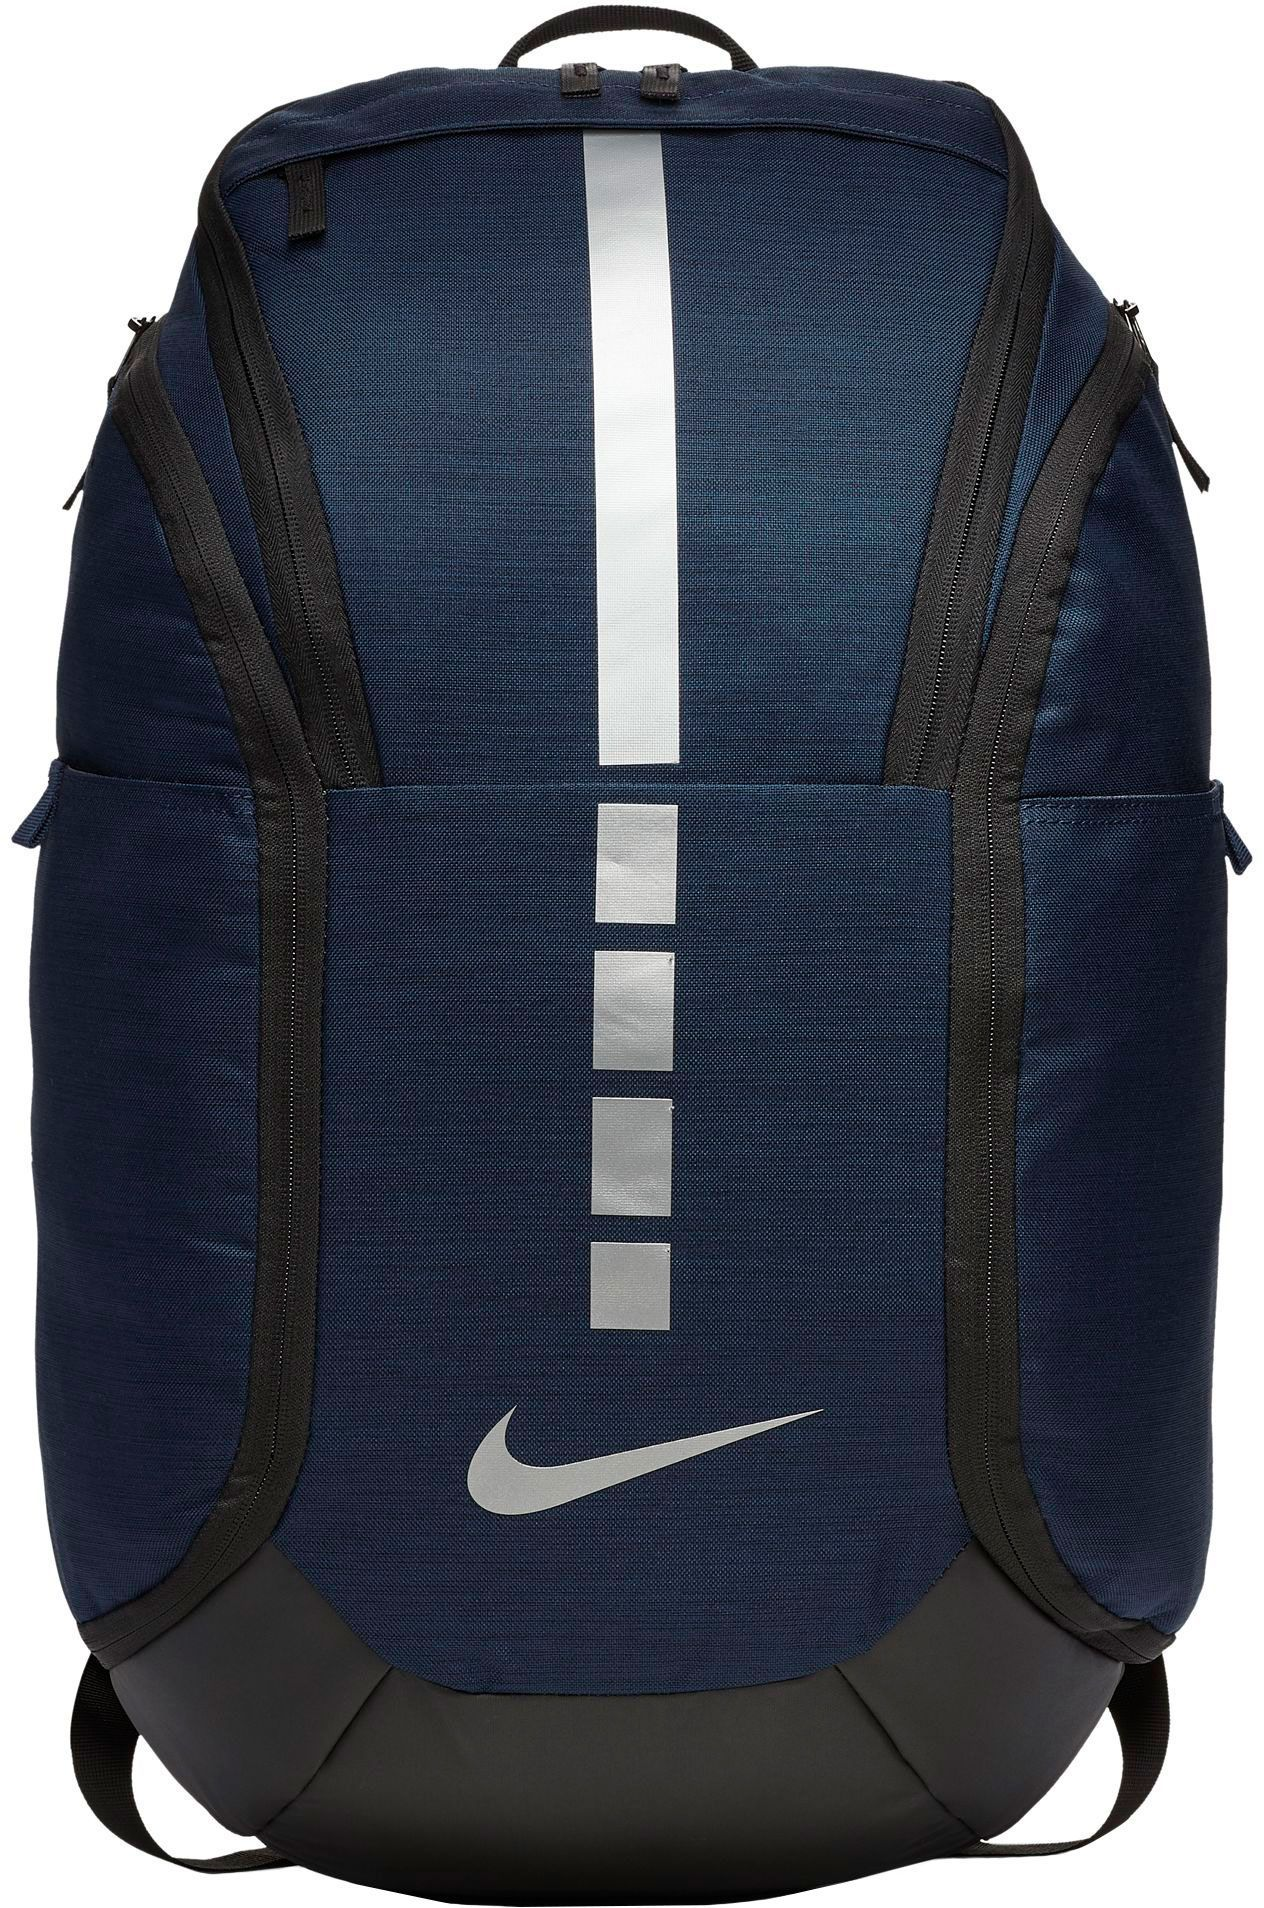 abf59dc16da Nike Hoops Elite Pro Basketball Backpack   Products   Pro basketball ...